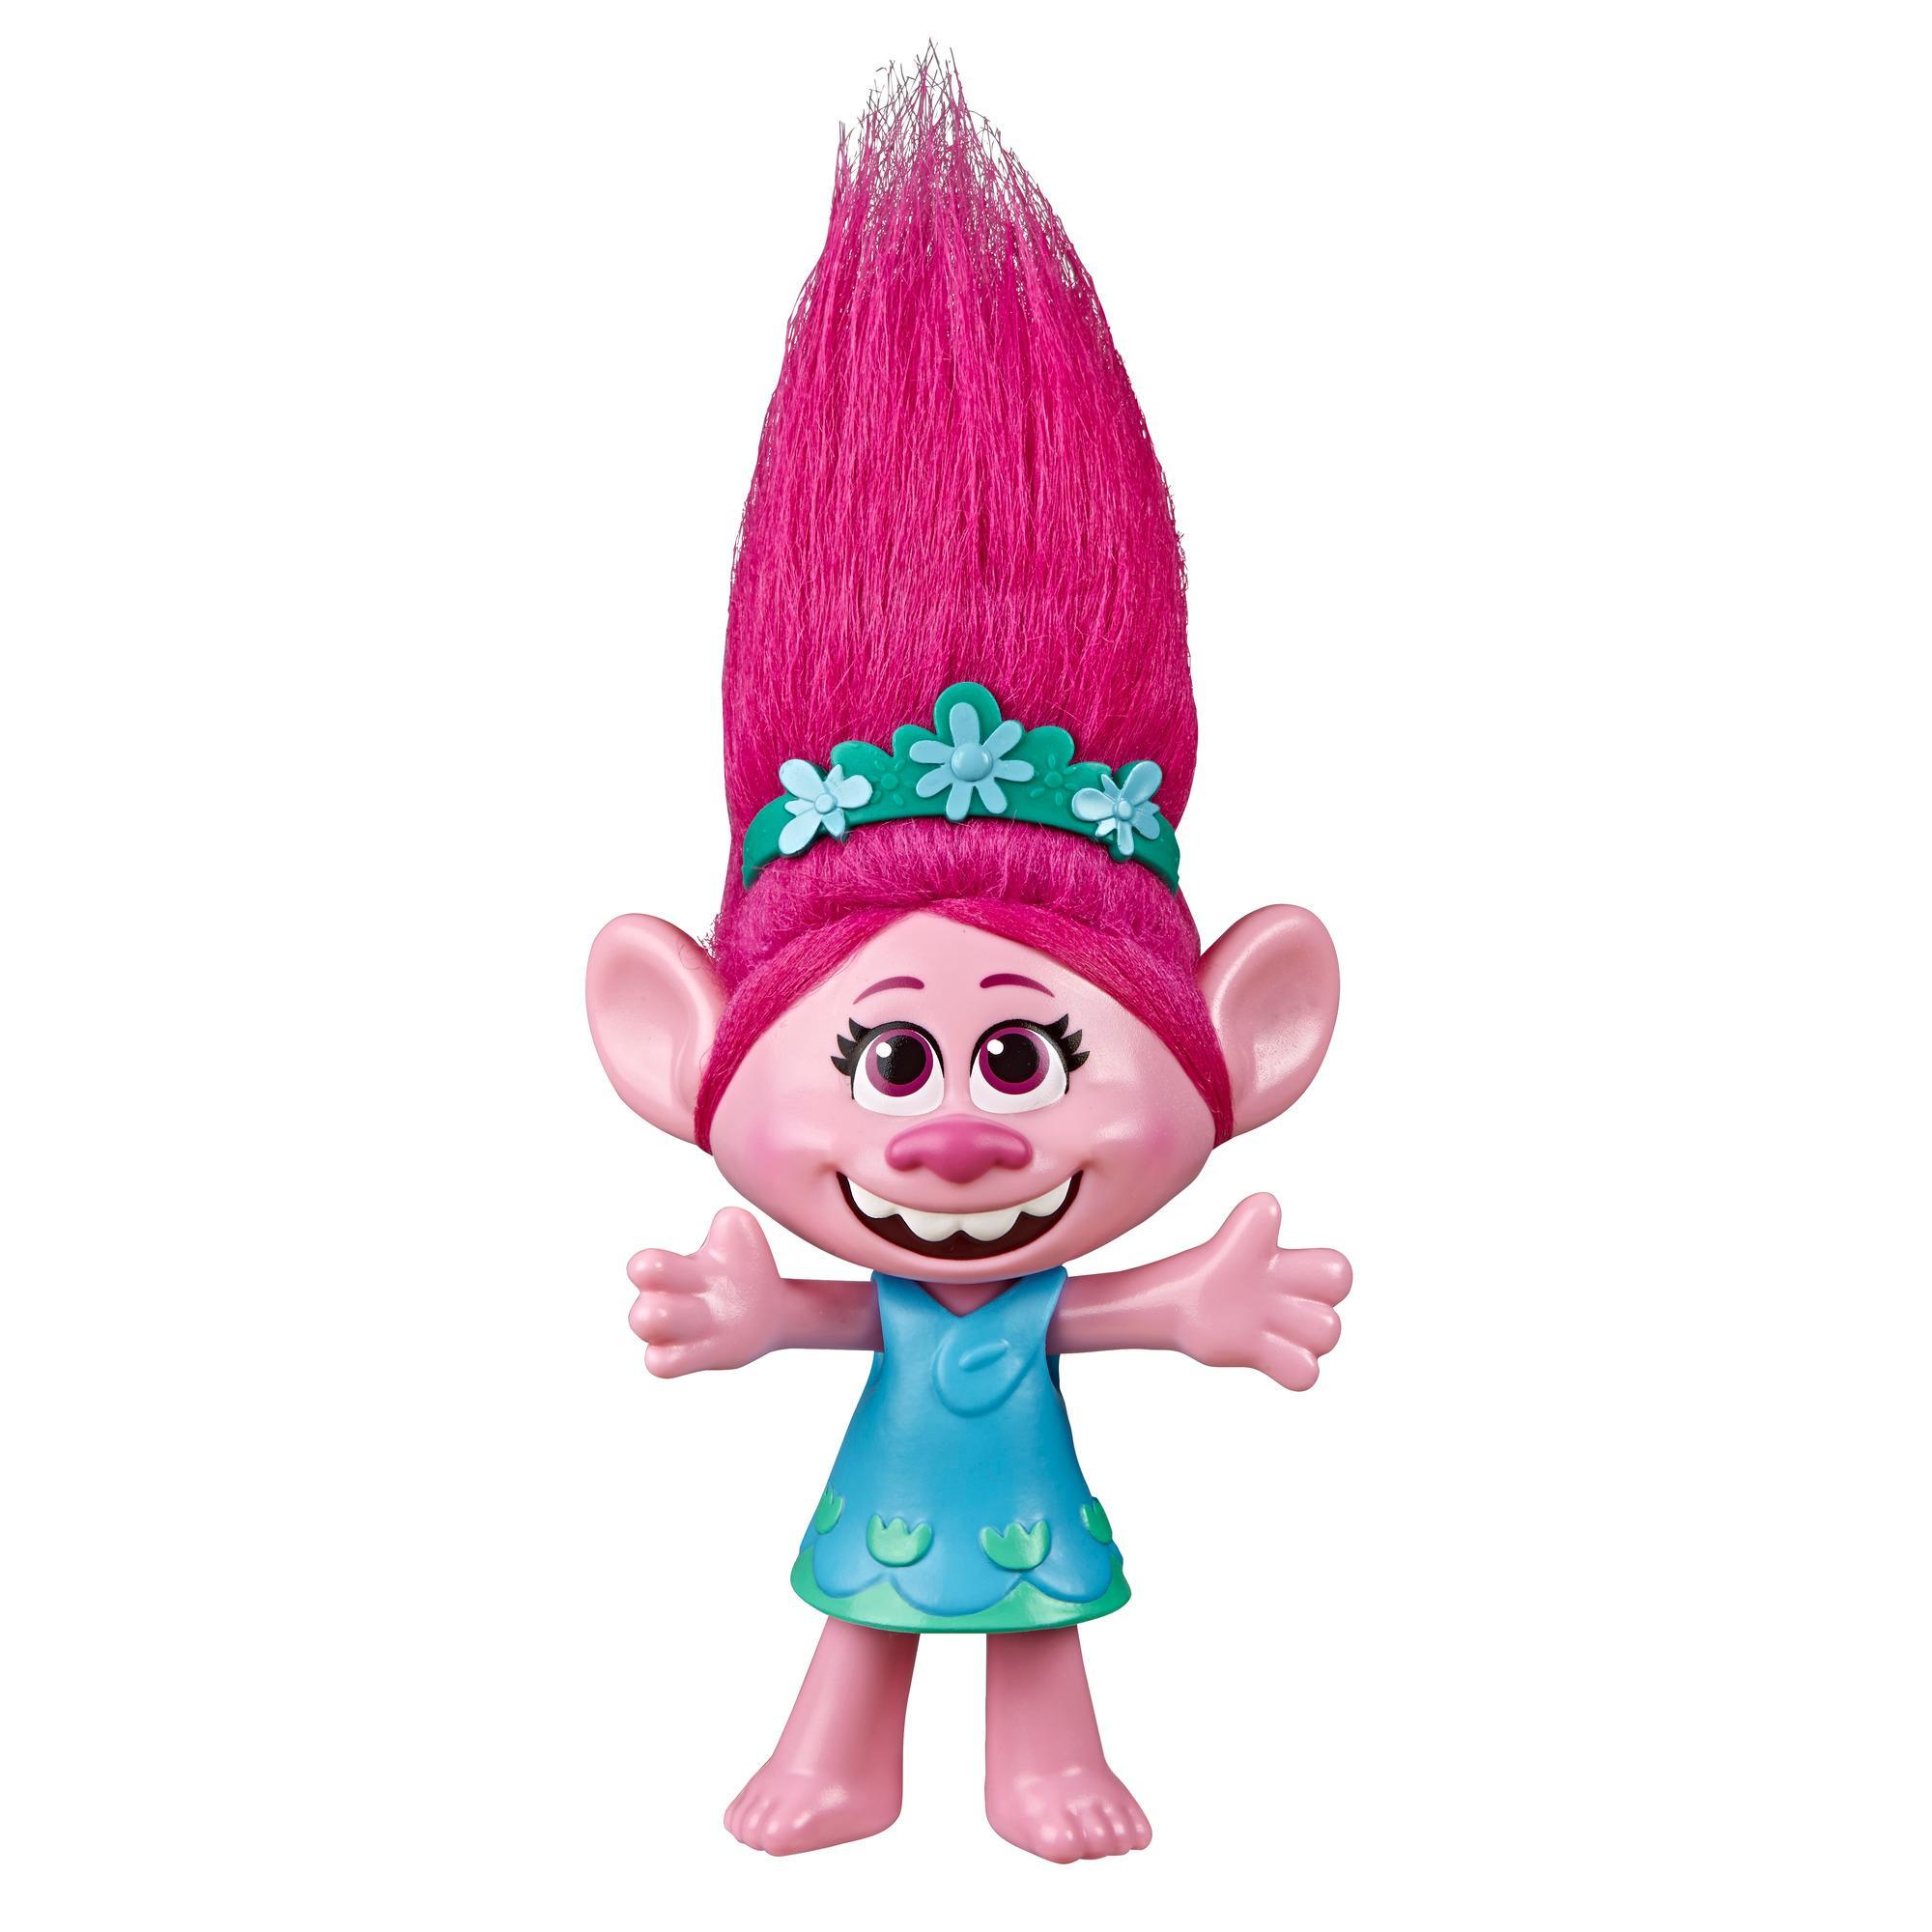 DreamWorks Trolls - Poppy Cantante pop